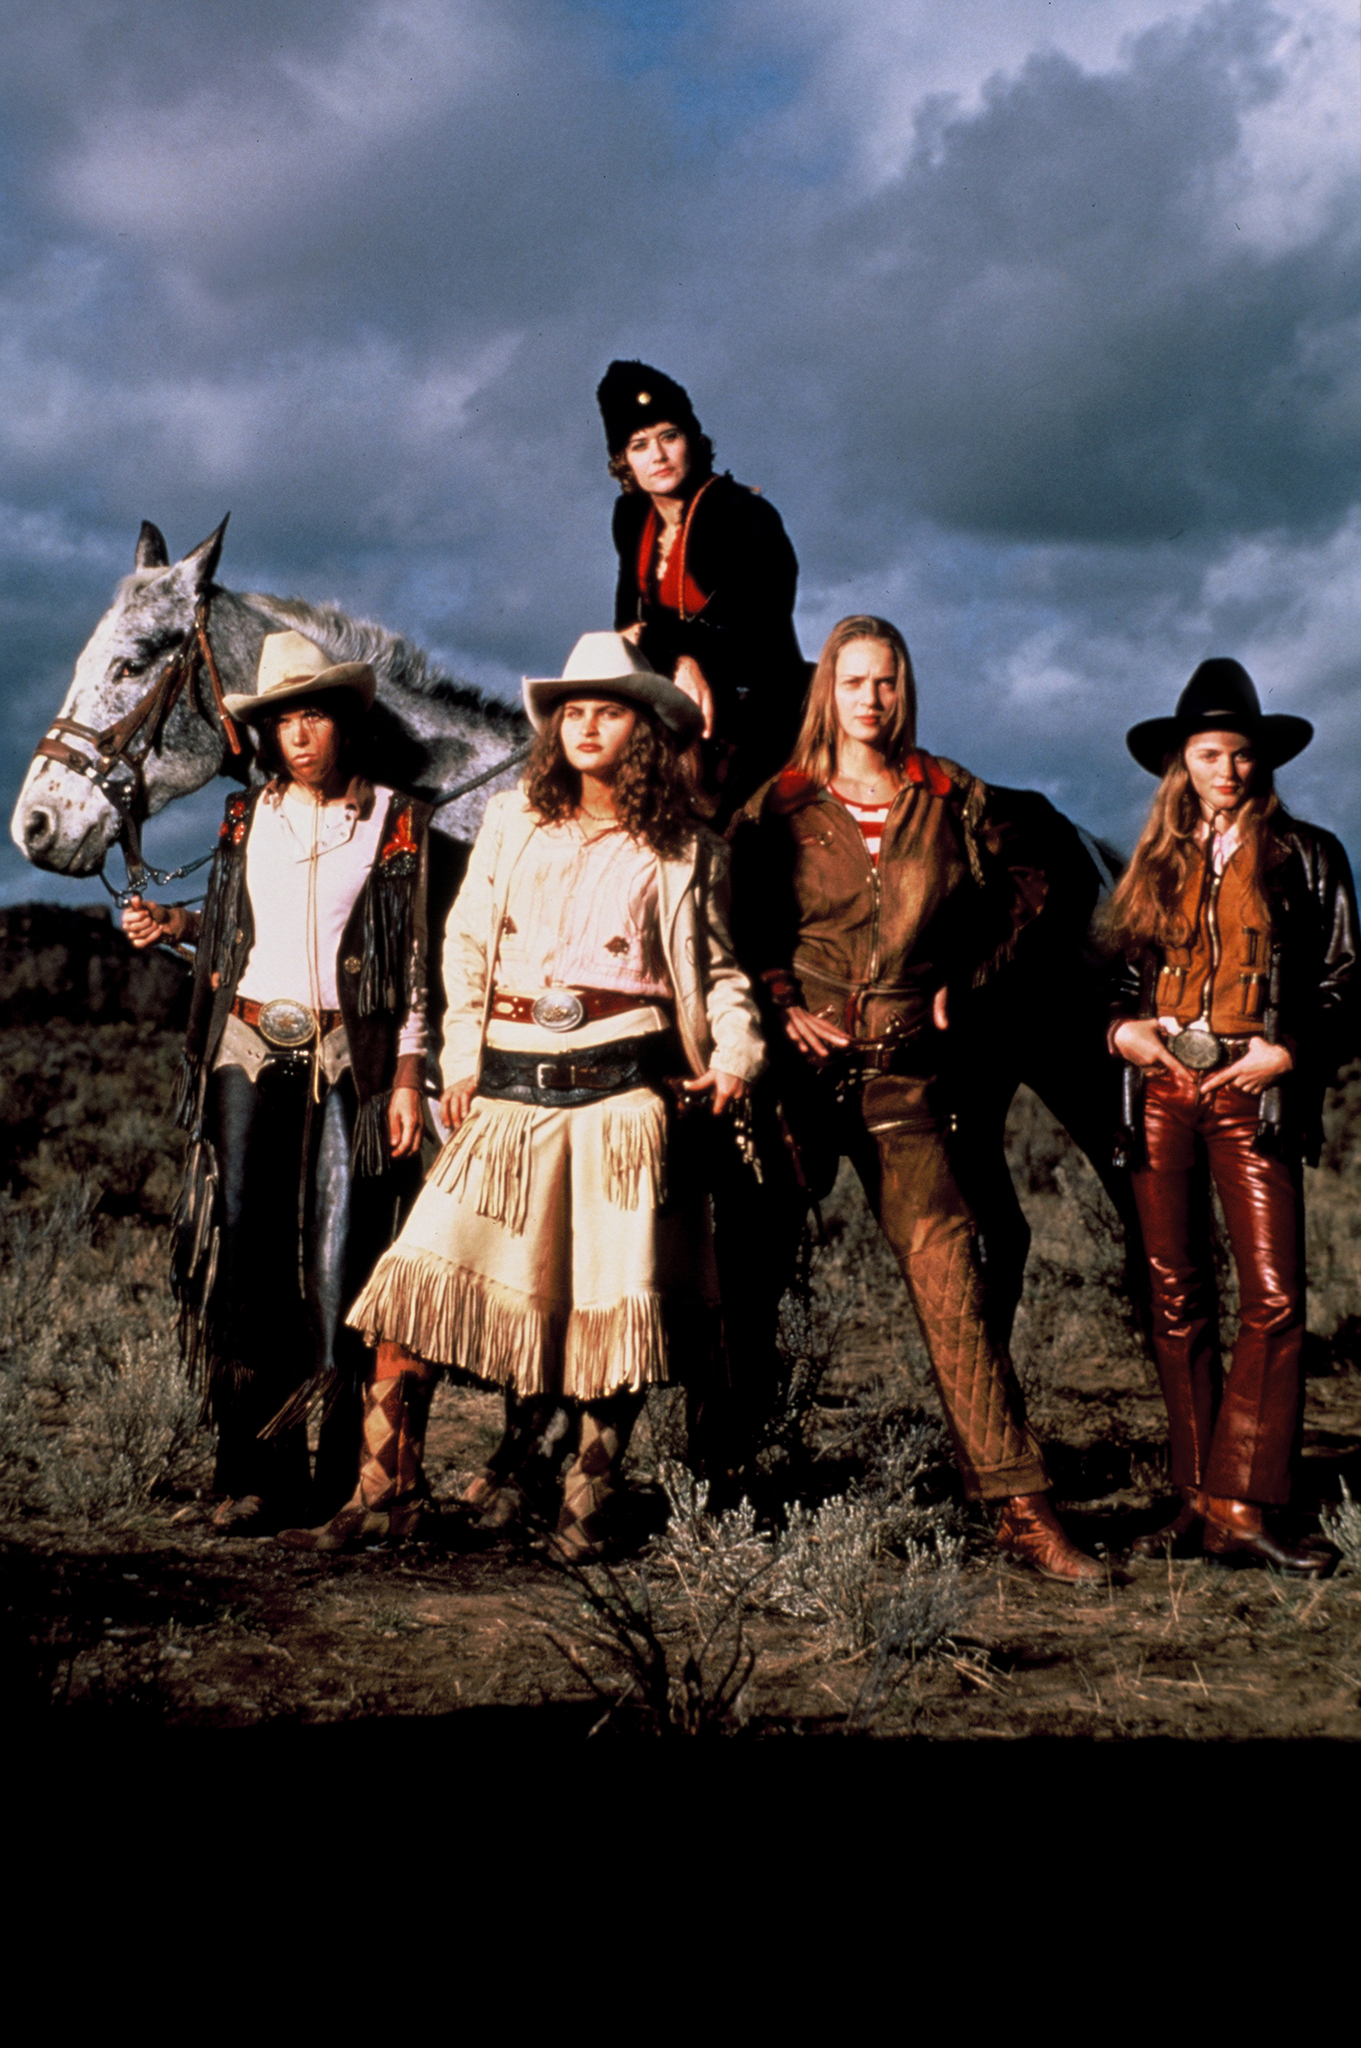 Uma Thurman, Lorraine Bracco, Heather Graham, and Rain Phoenix in Even Cowgirls Get the Blues (1993)